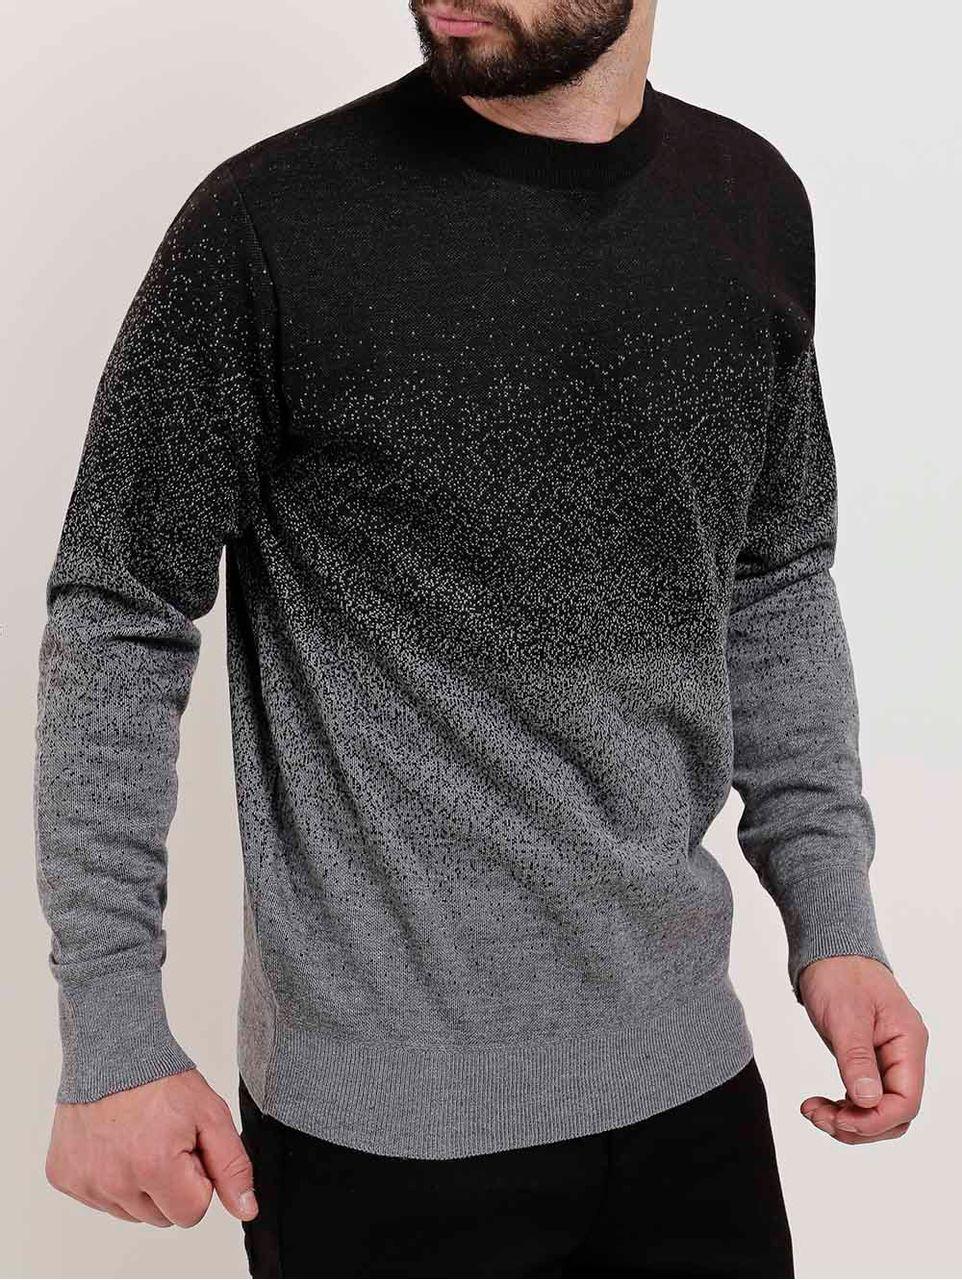 Blusão Masculino Preto/cinza